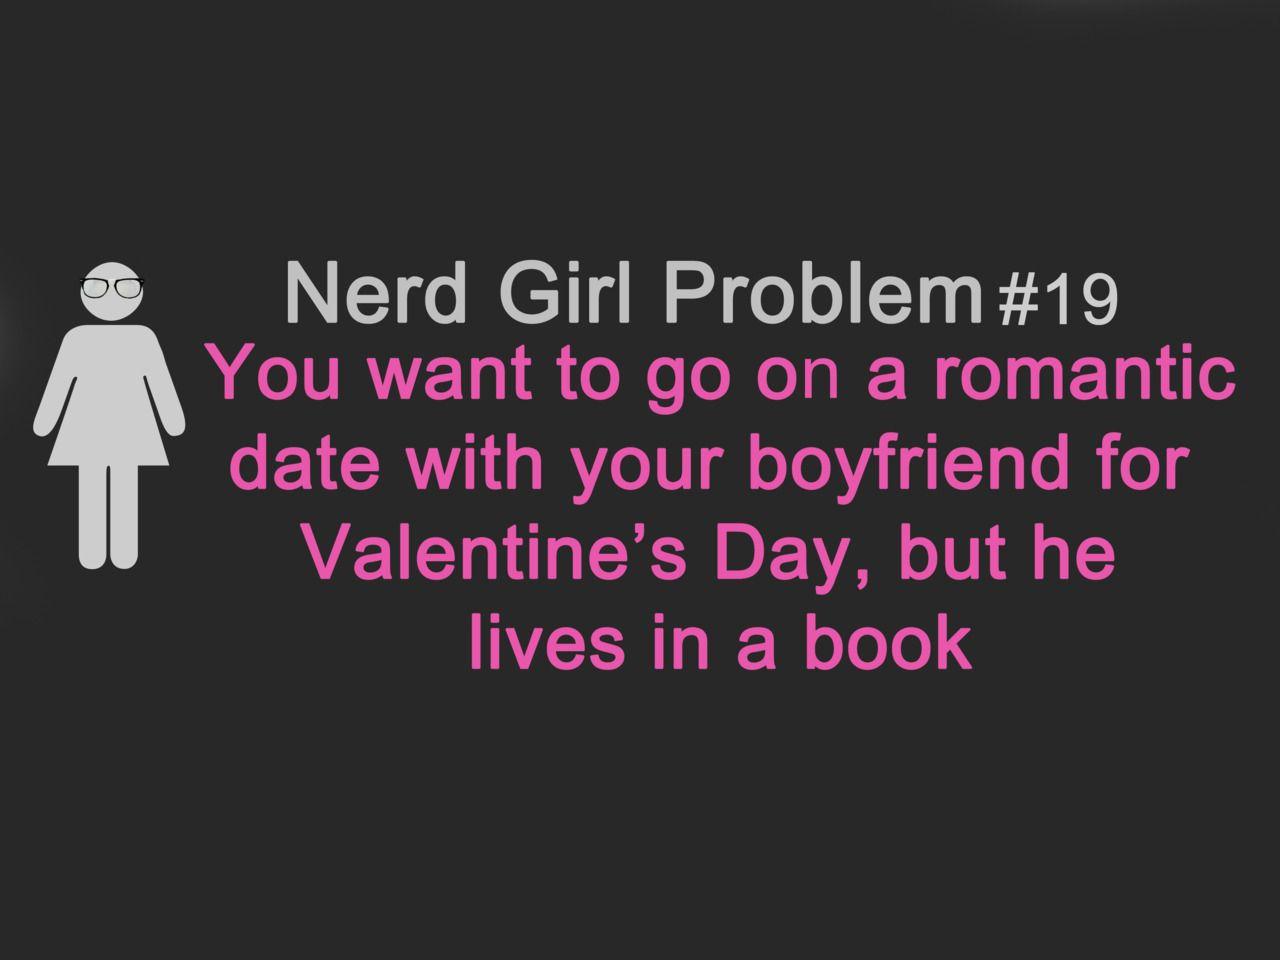 Nerd+Girl+Problems | Mundinho Insano: Nerd Girl Problems